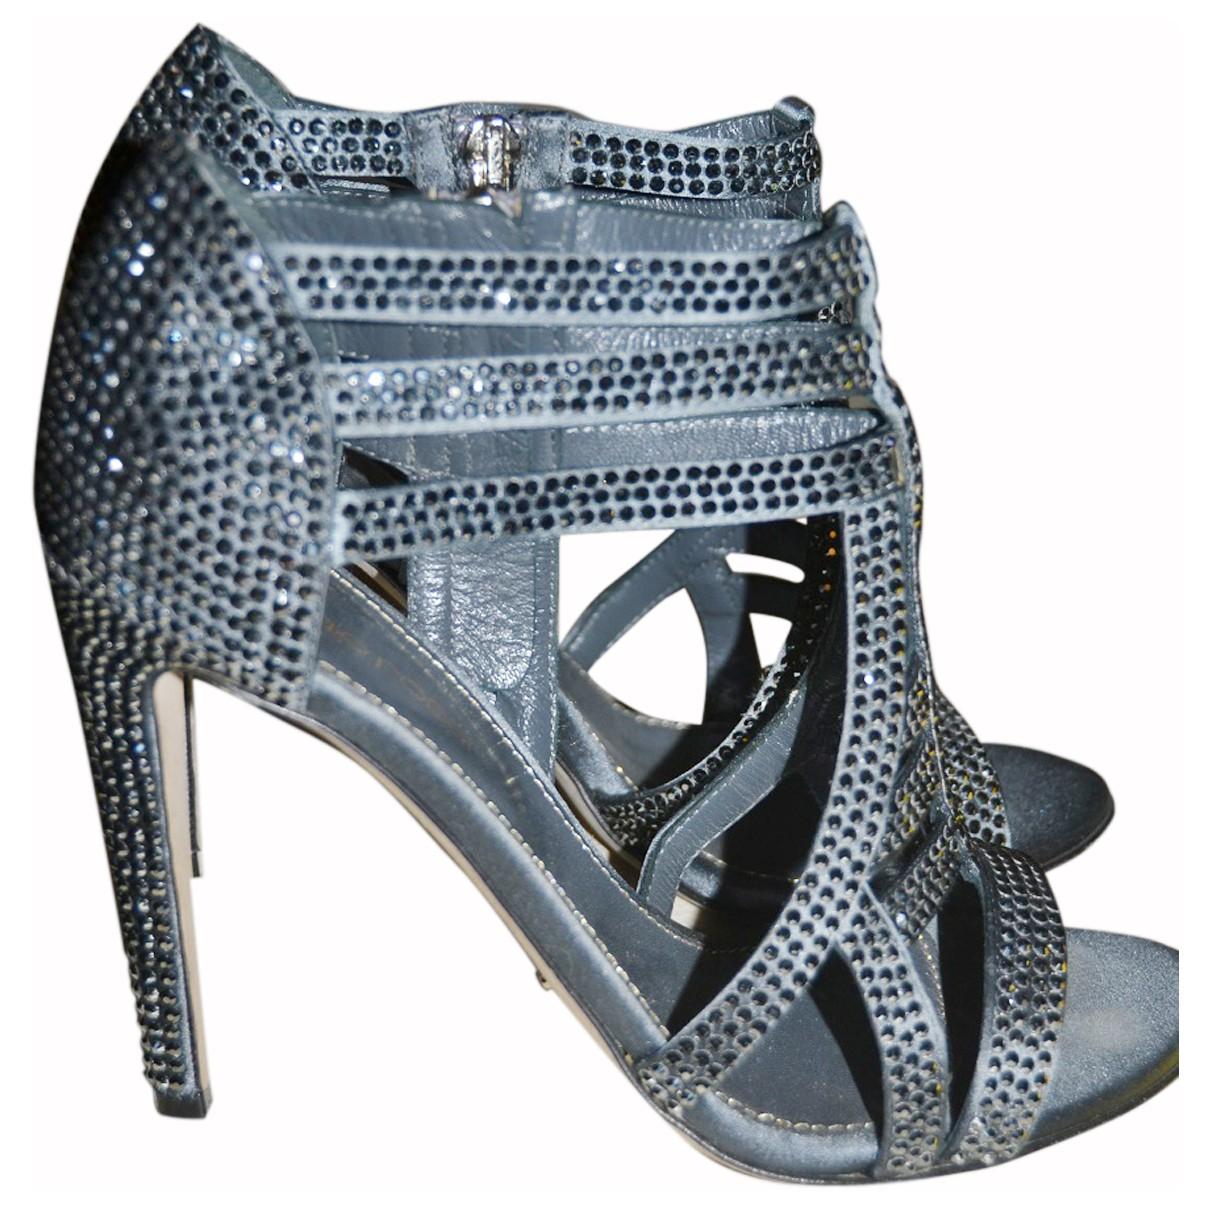 Sergio Rossi N Black Cloth Sandals for Women 36.5 IT